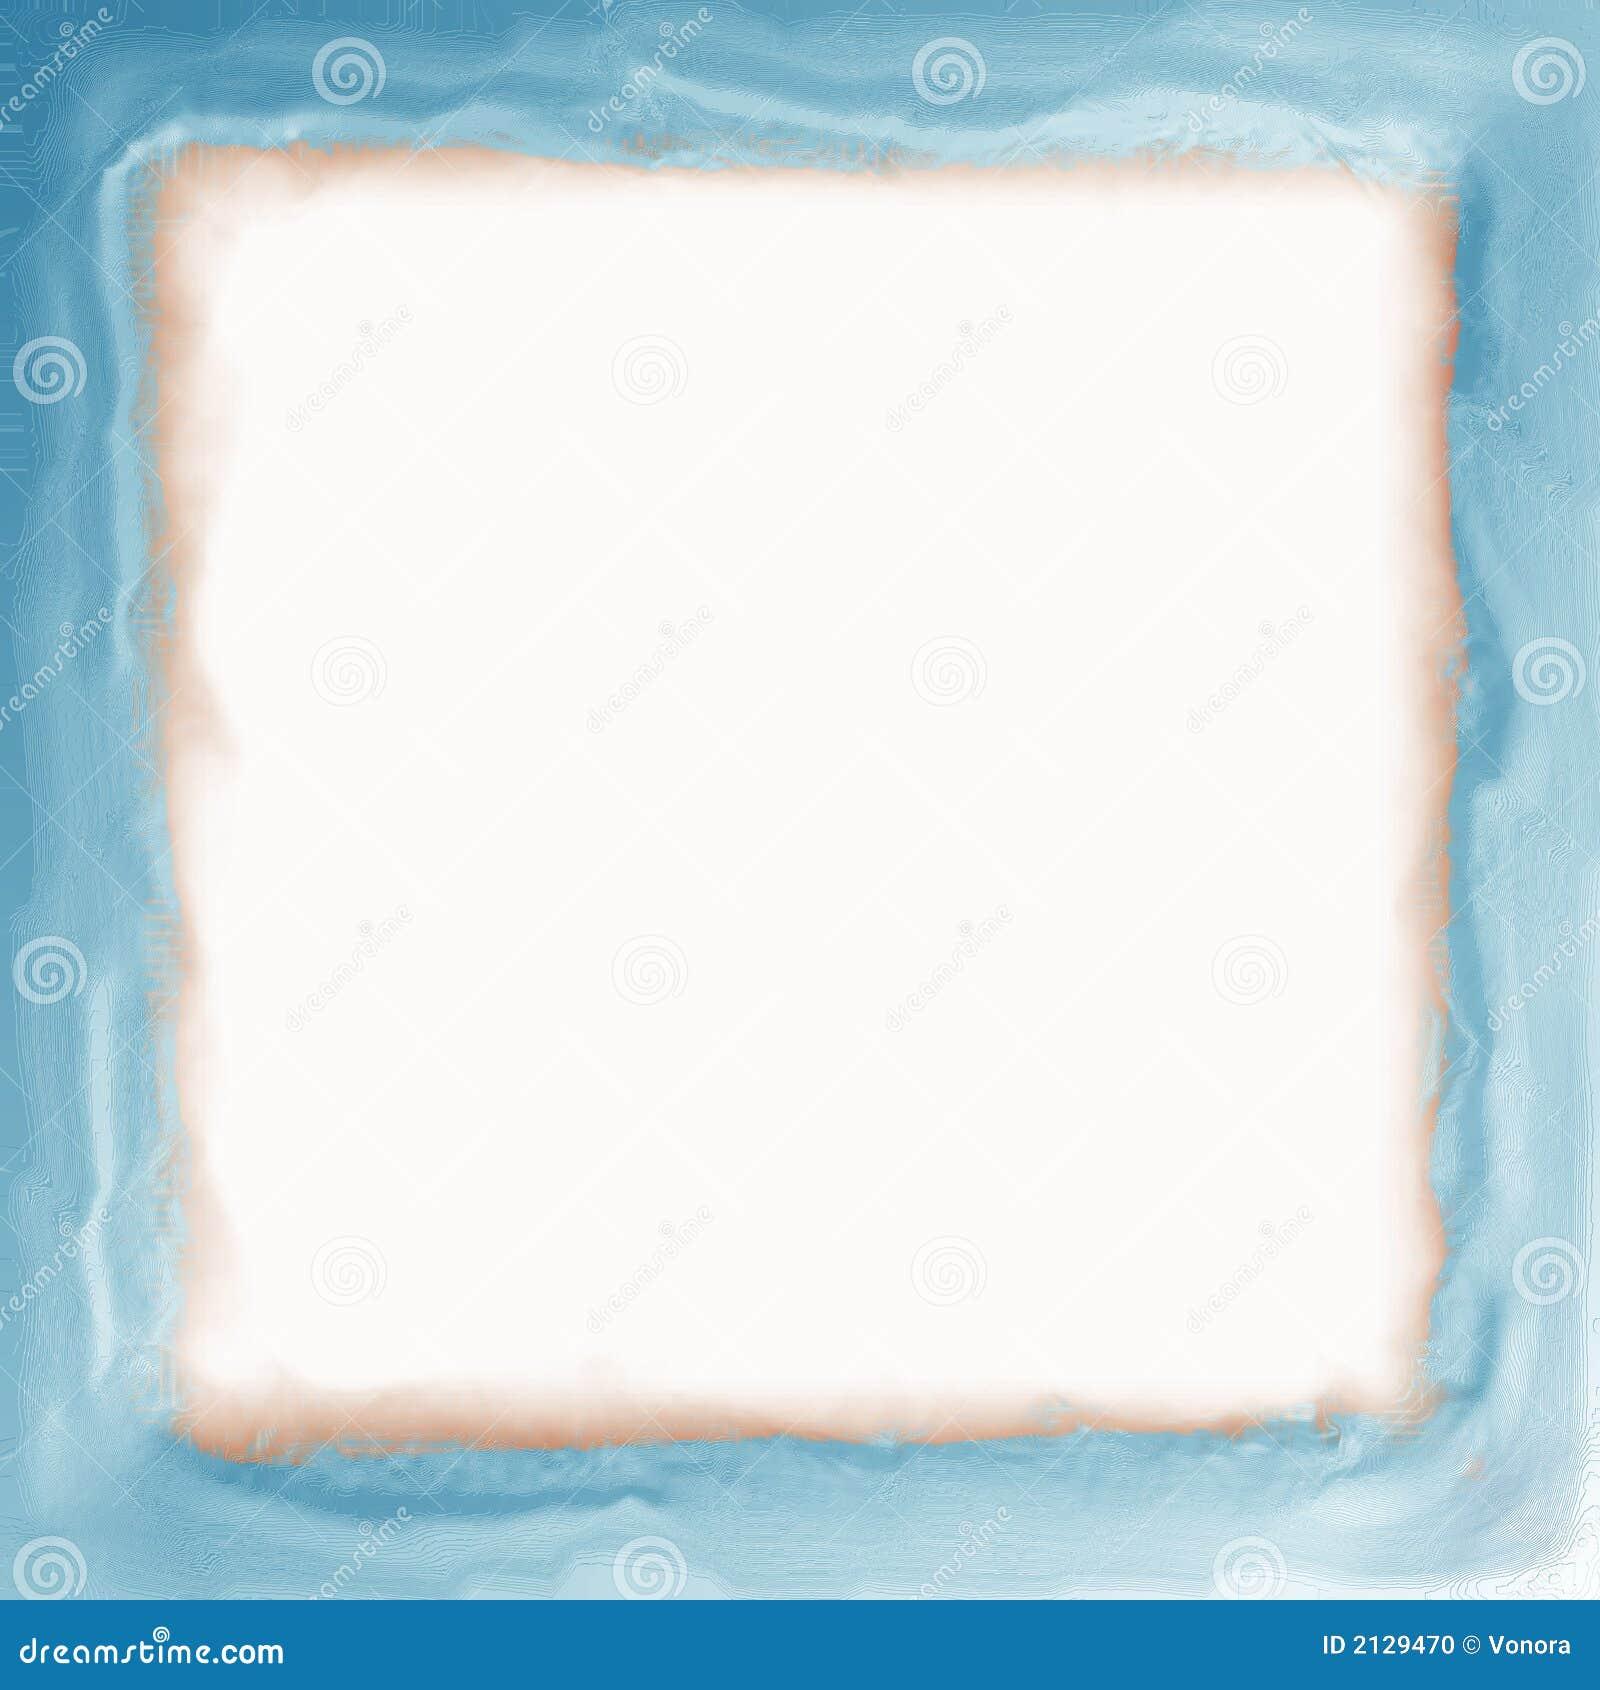 Blue frame with soft edges